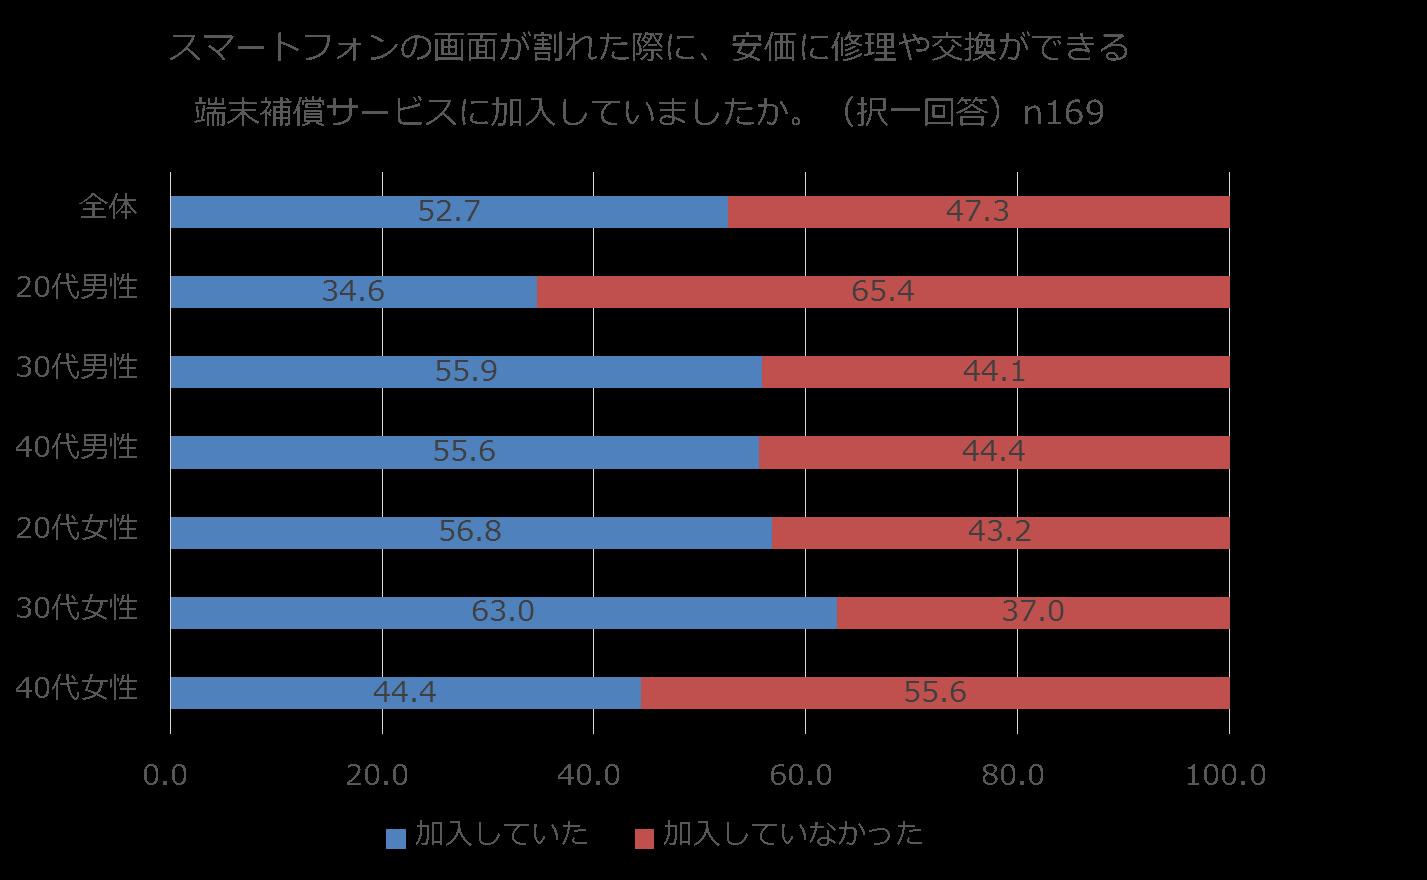 %e7%ab%af%e6%9c%ab%e8%a3%9c%e5%84%9f%e3%82%b5%e3%83%bc%e3%83%93%e3%82%b9